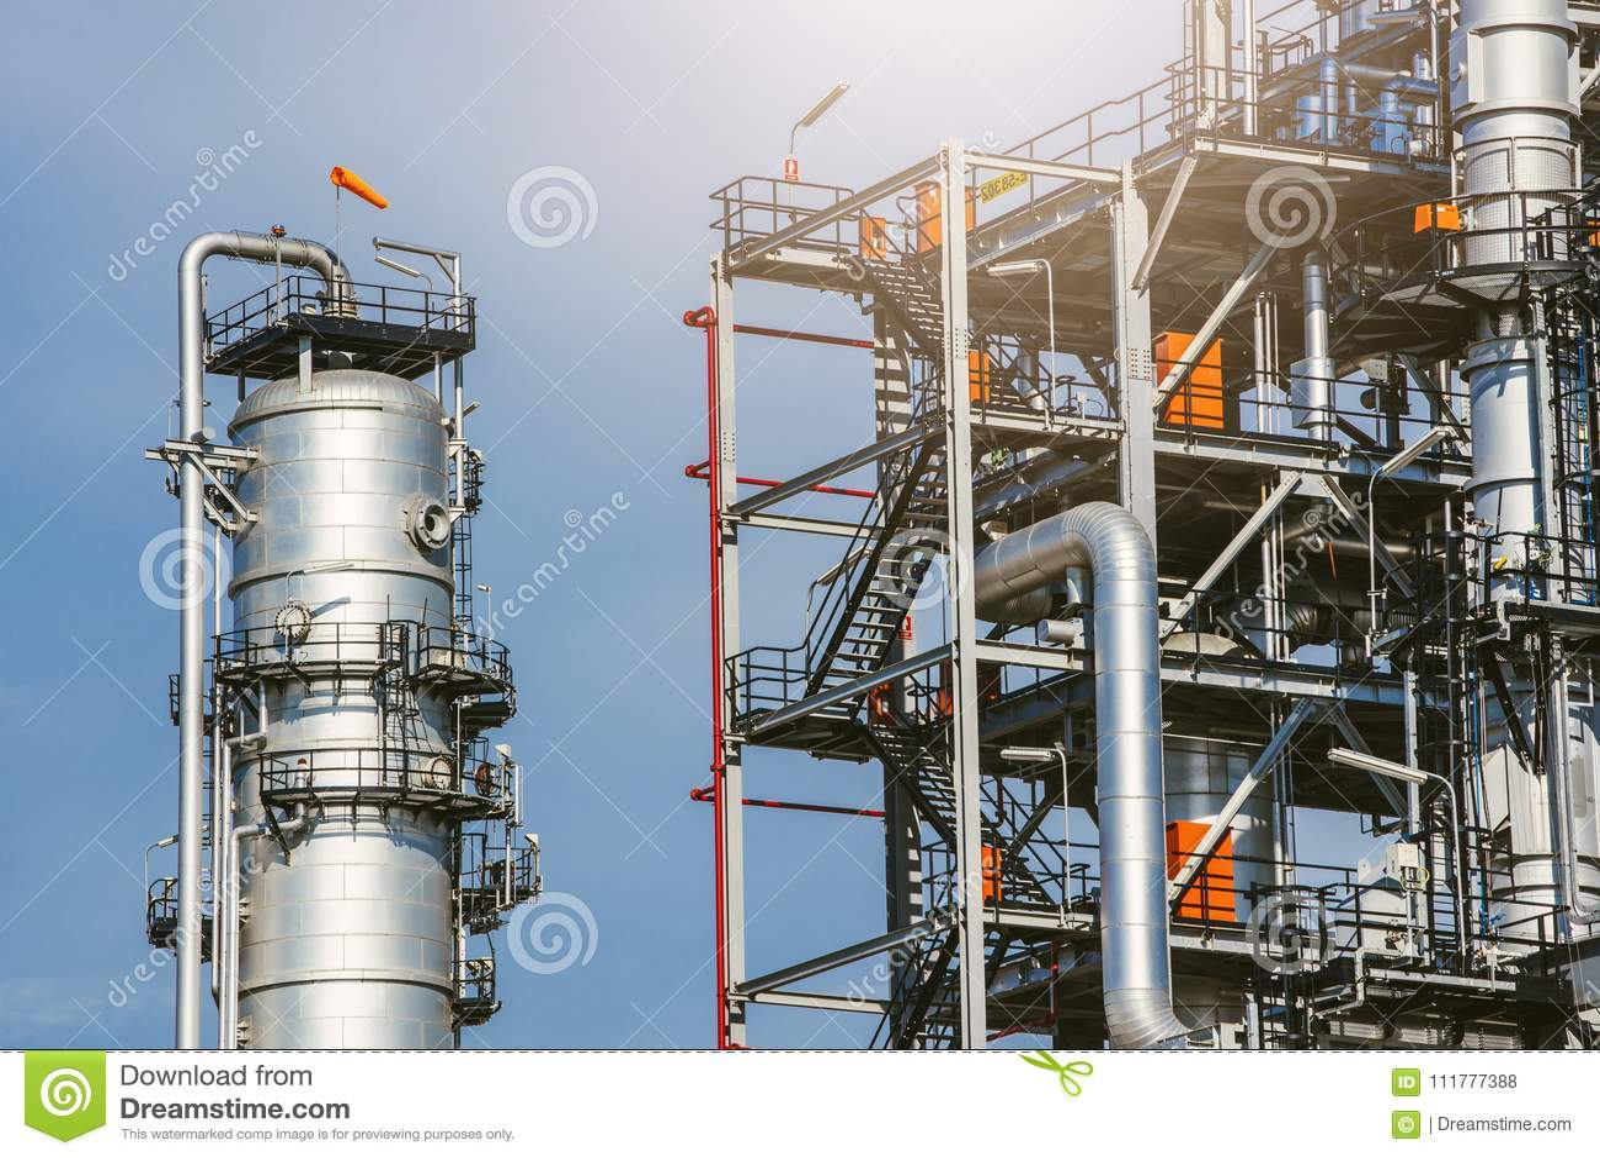 Industrial zone,oil refinery,oil pipeline